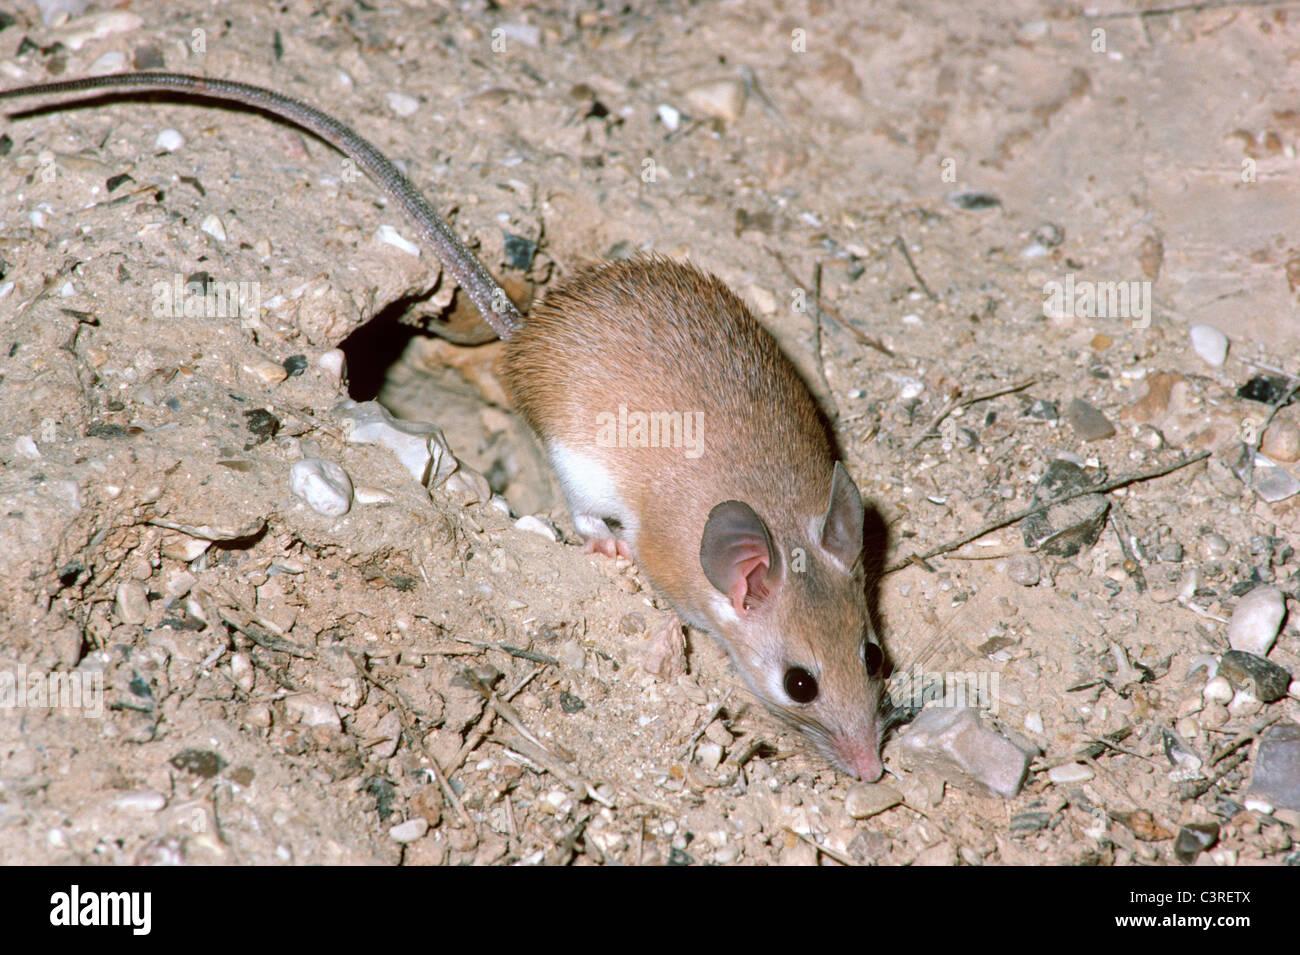 deer mouse, Peromyscus maniculatus (Rodentia: Muridae) - 2133024